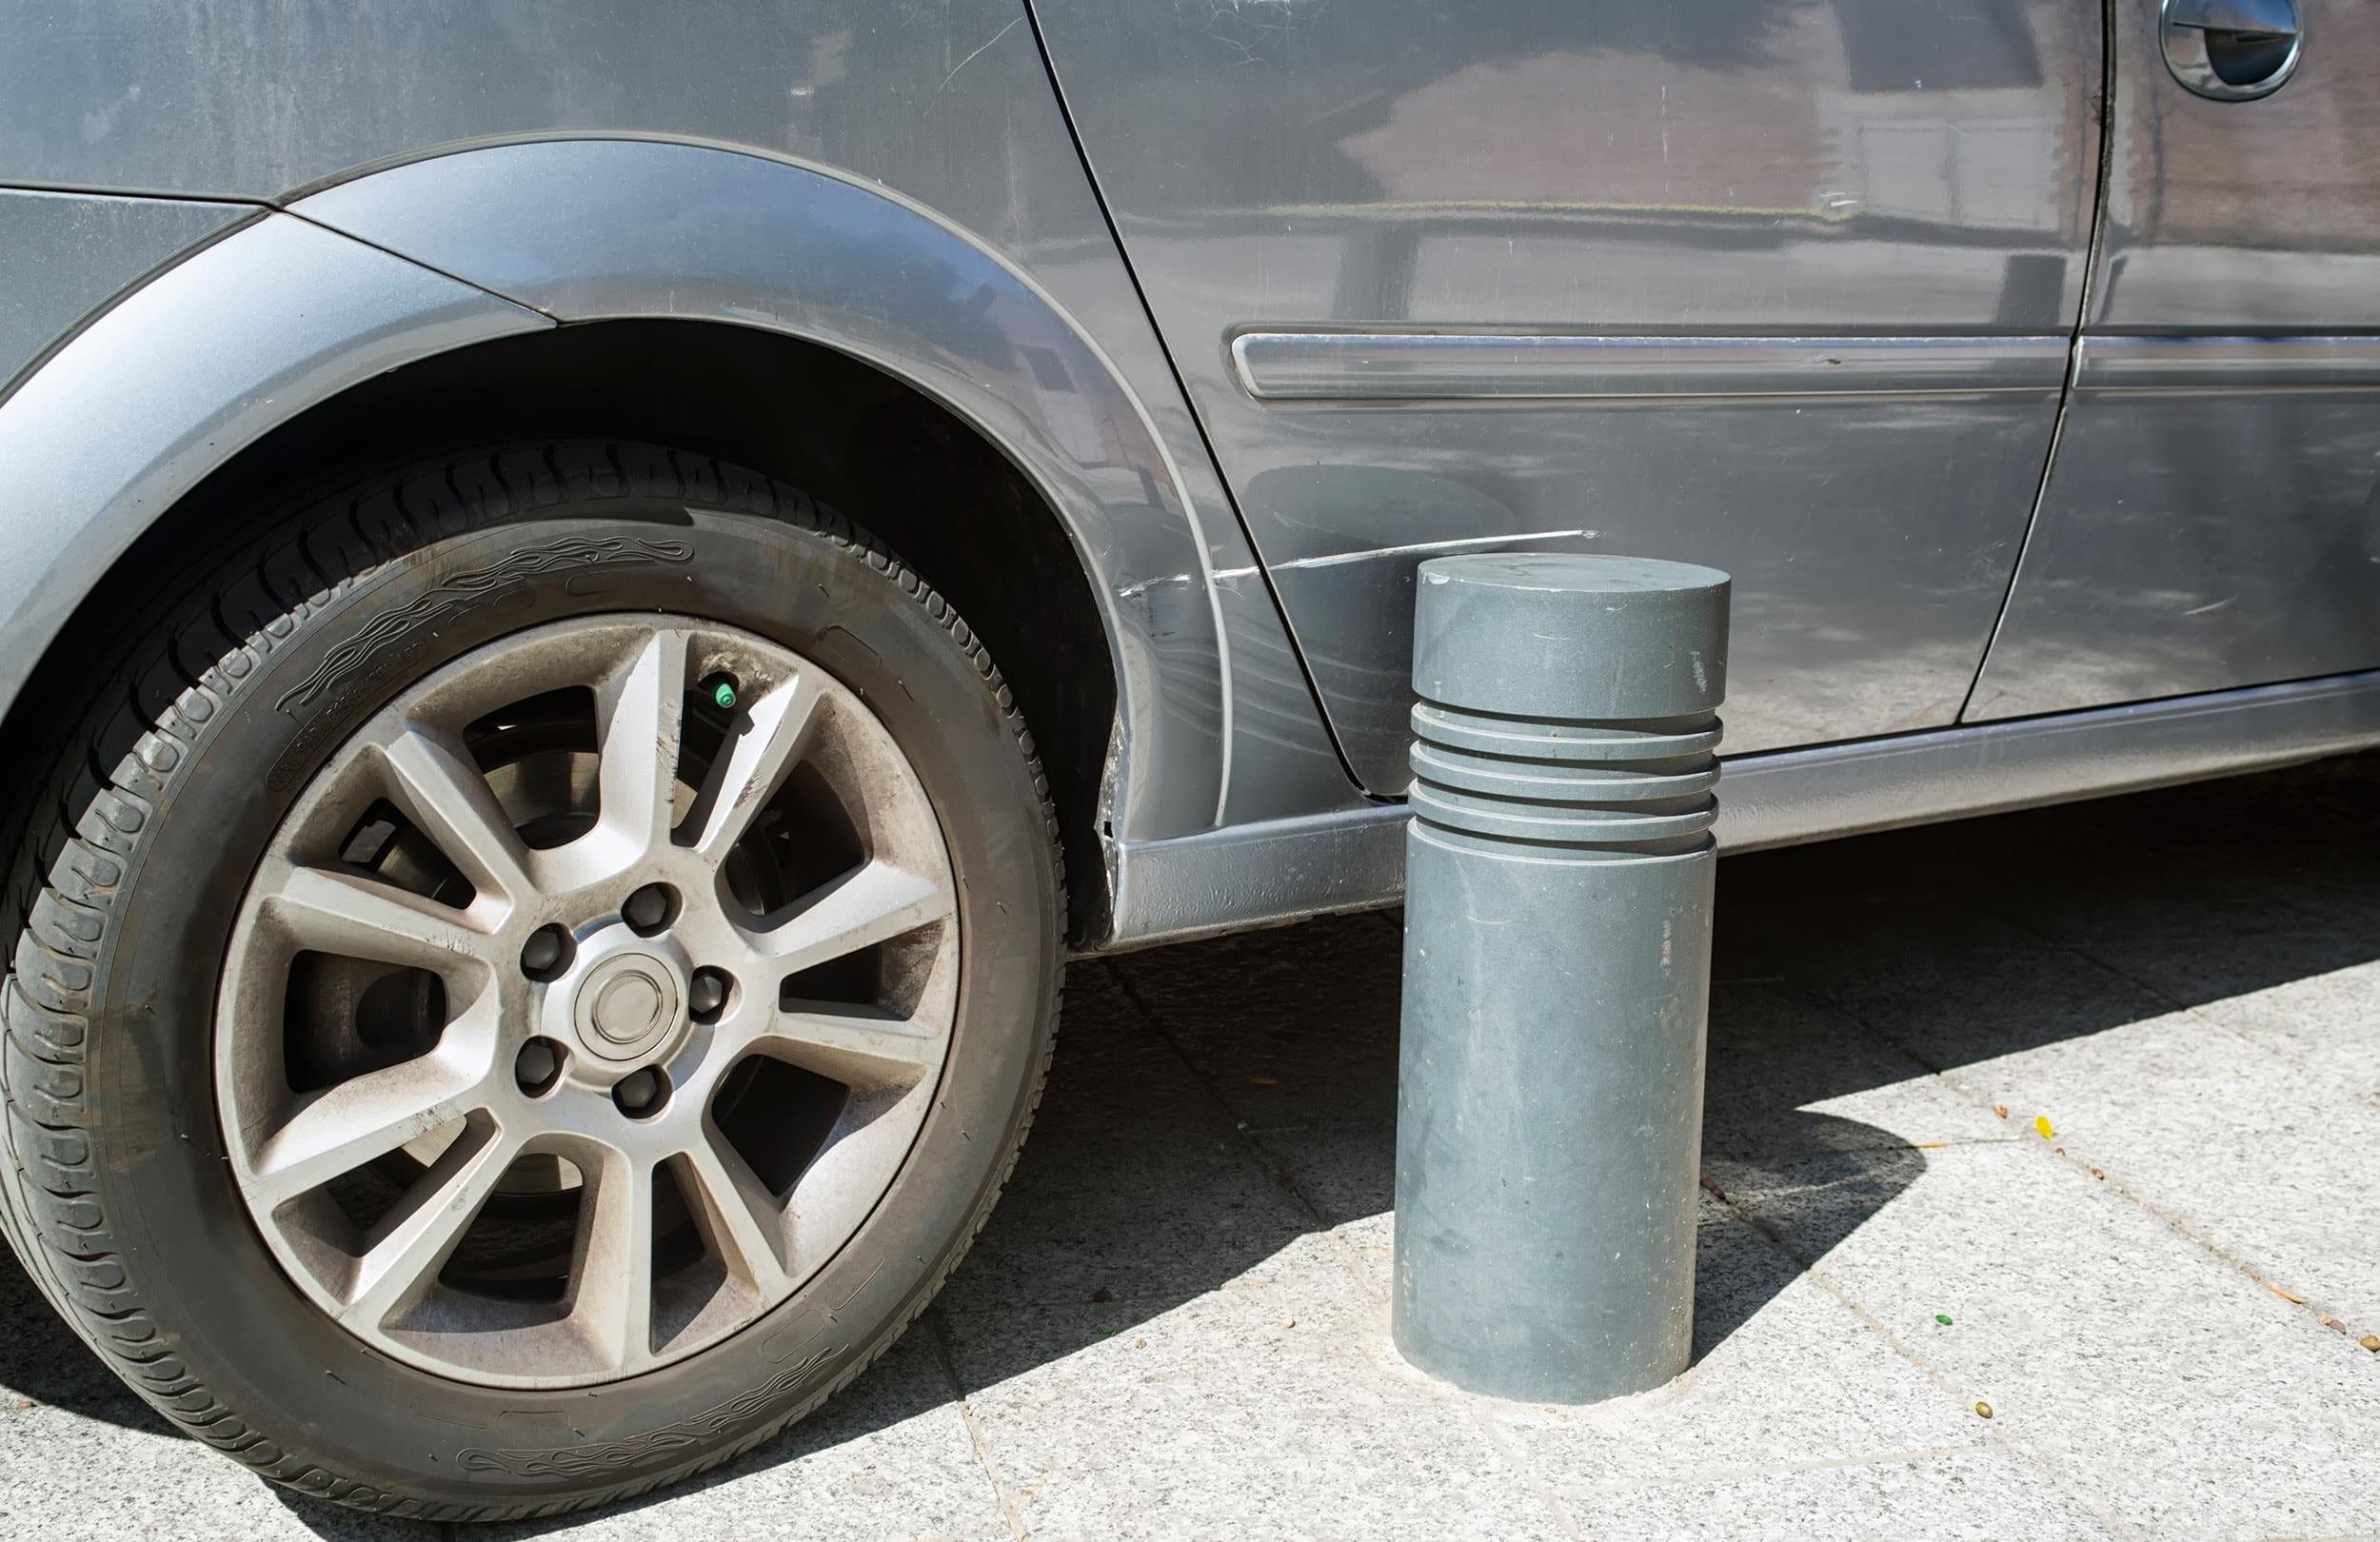 Parkieren Kollision mit Objekt